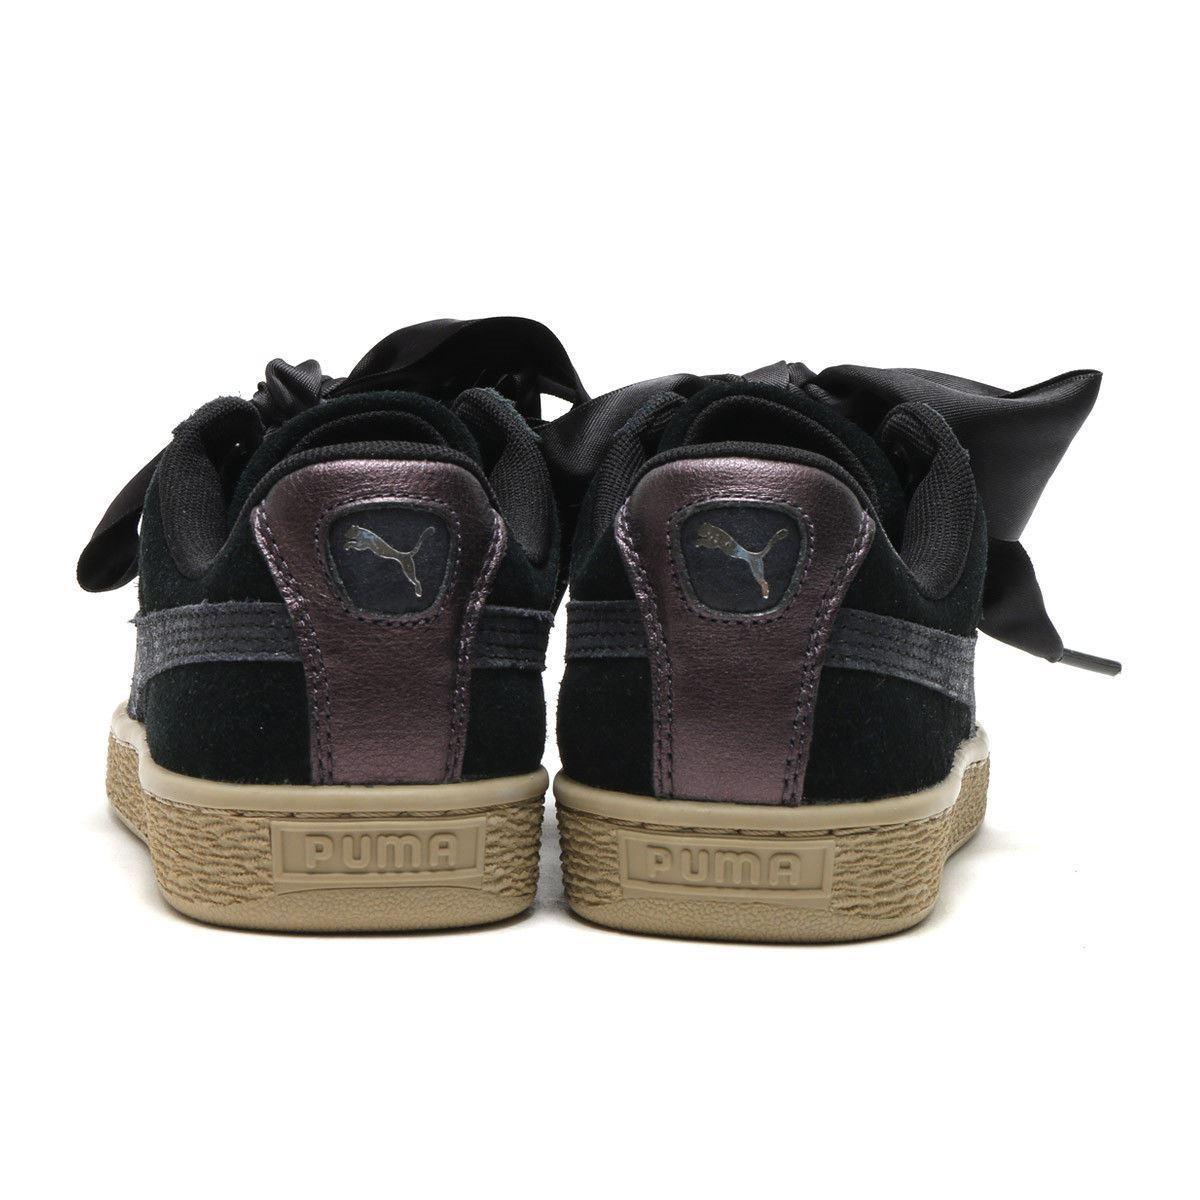 89c96e490d71b0 4 of 6 Puma 364083 03 Suede Heart Safari Black Women s Athletic Sneaker